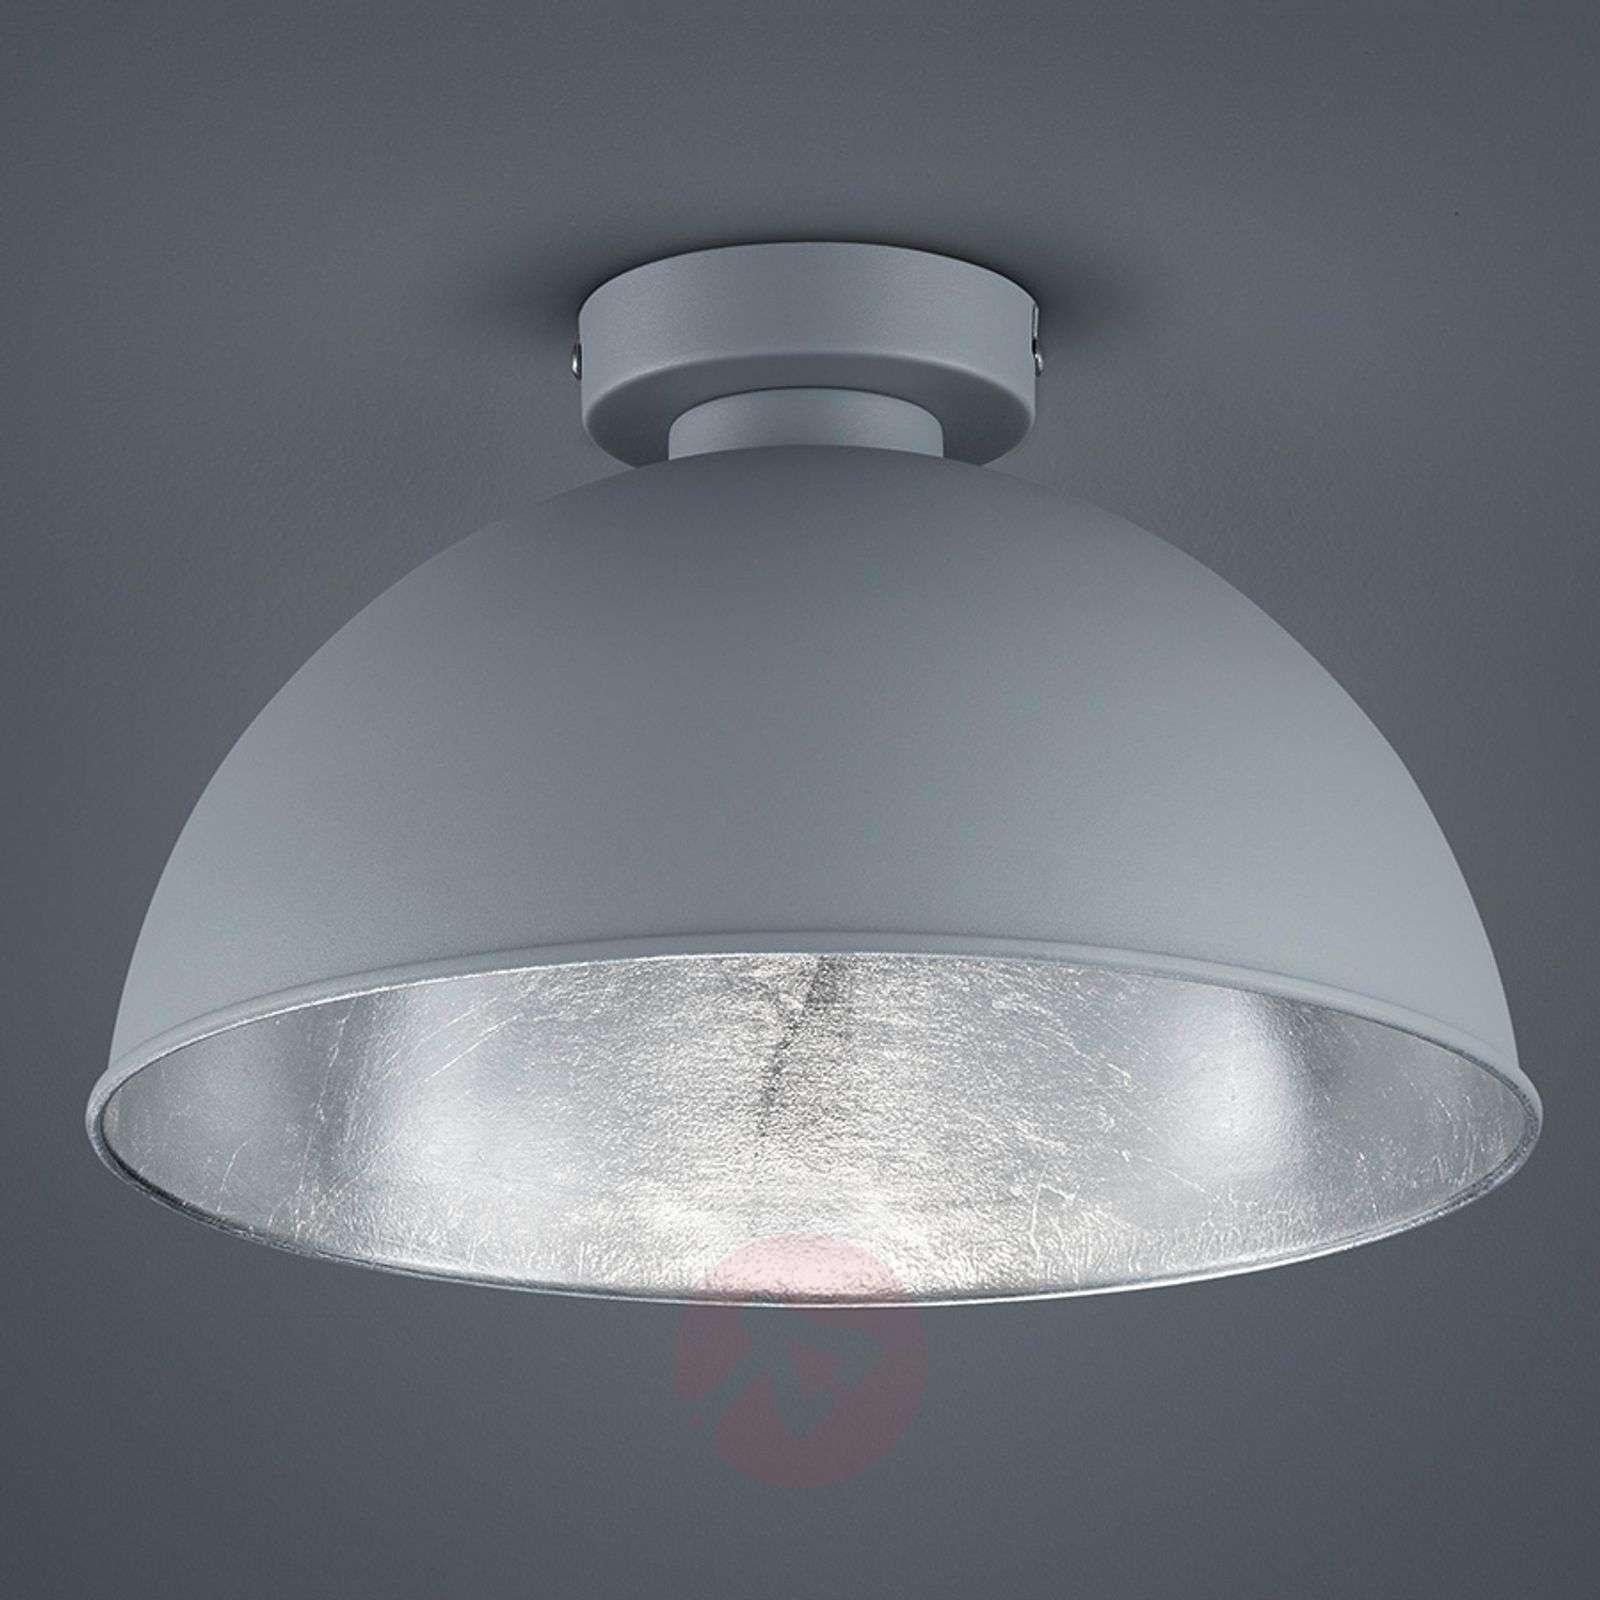 Jimmy metal ceiling light in grey/silver-8029094-01